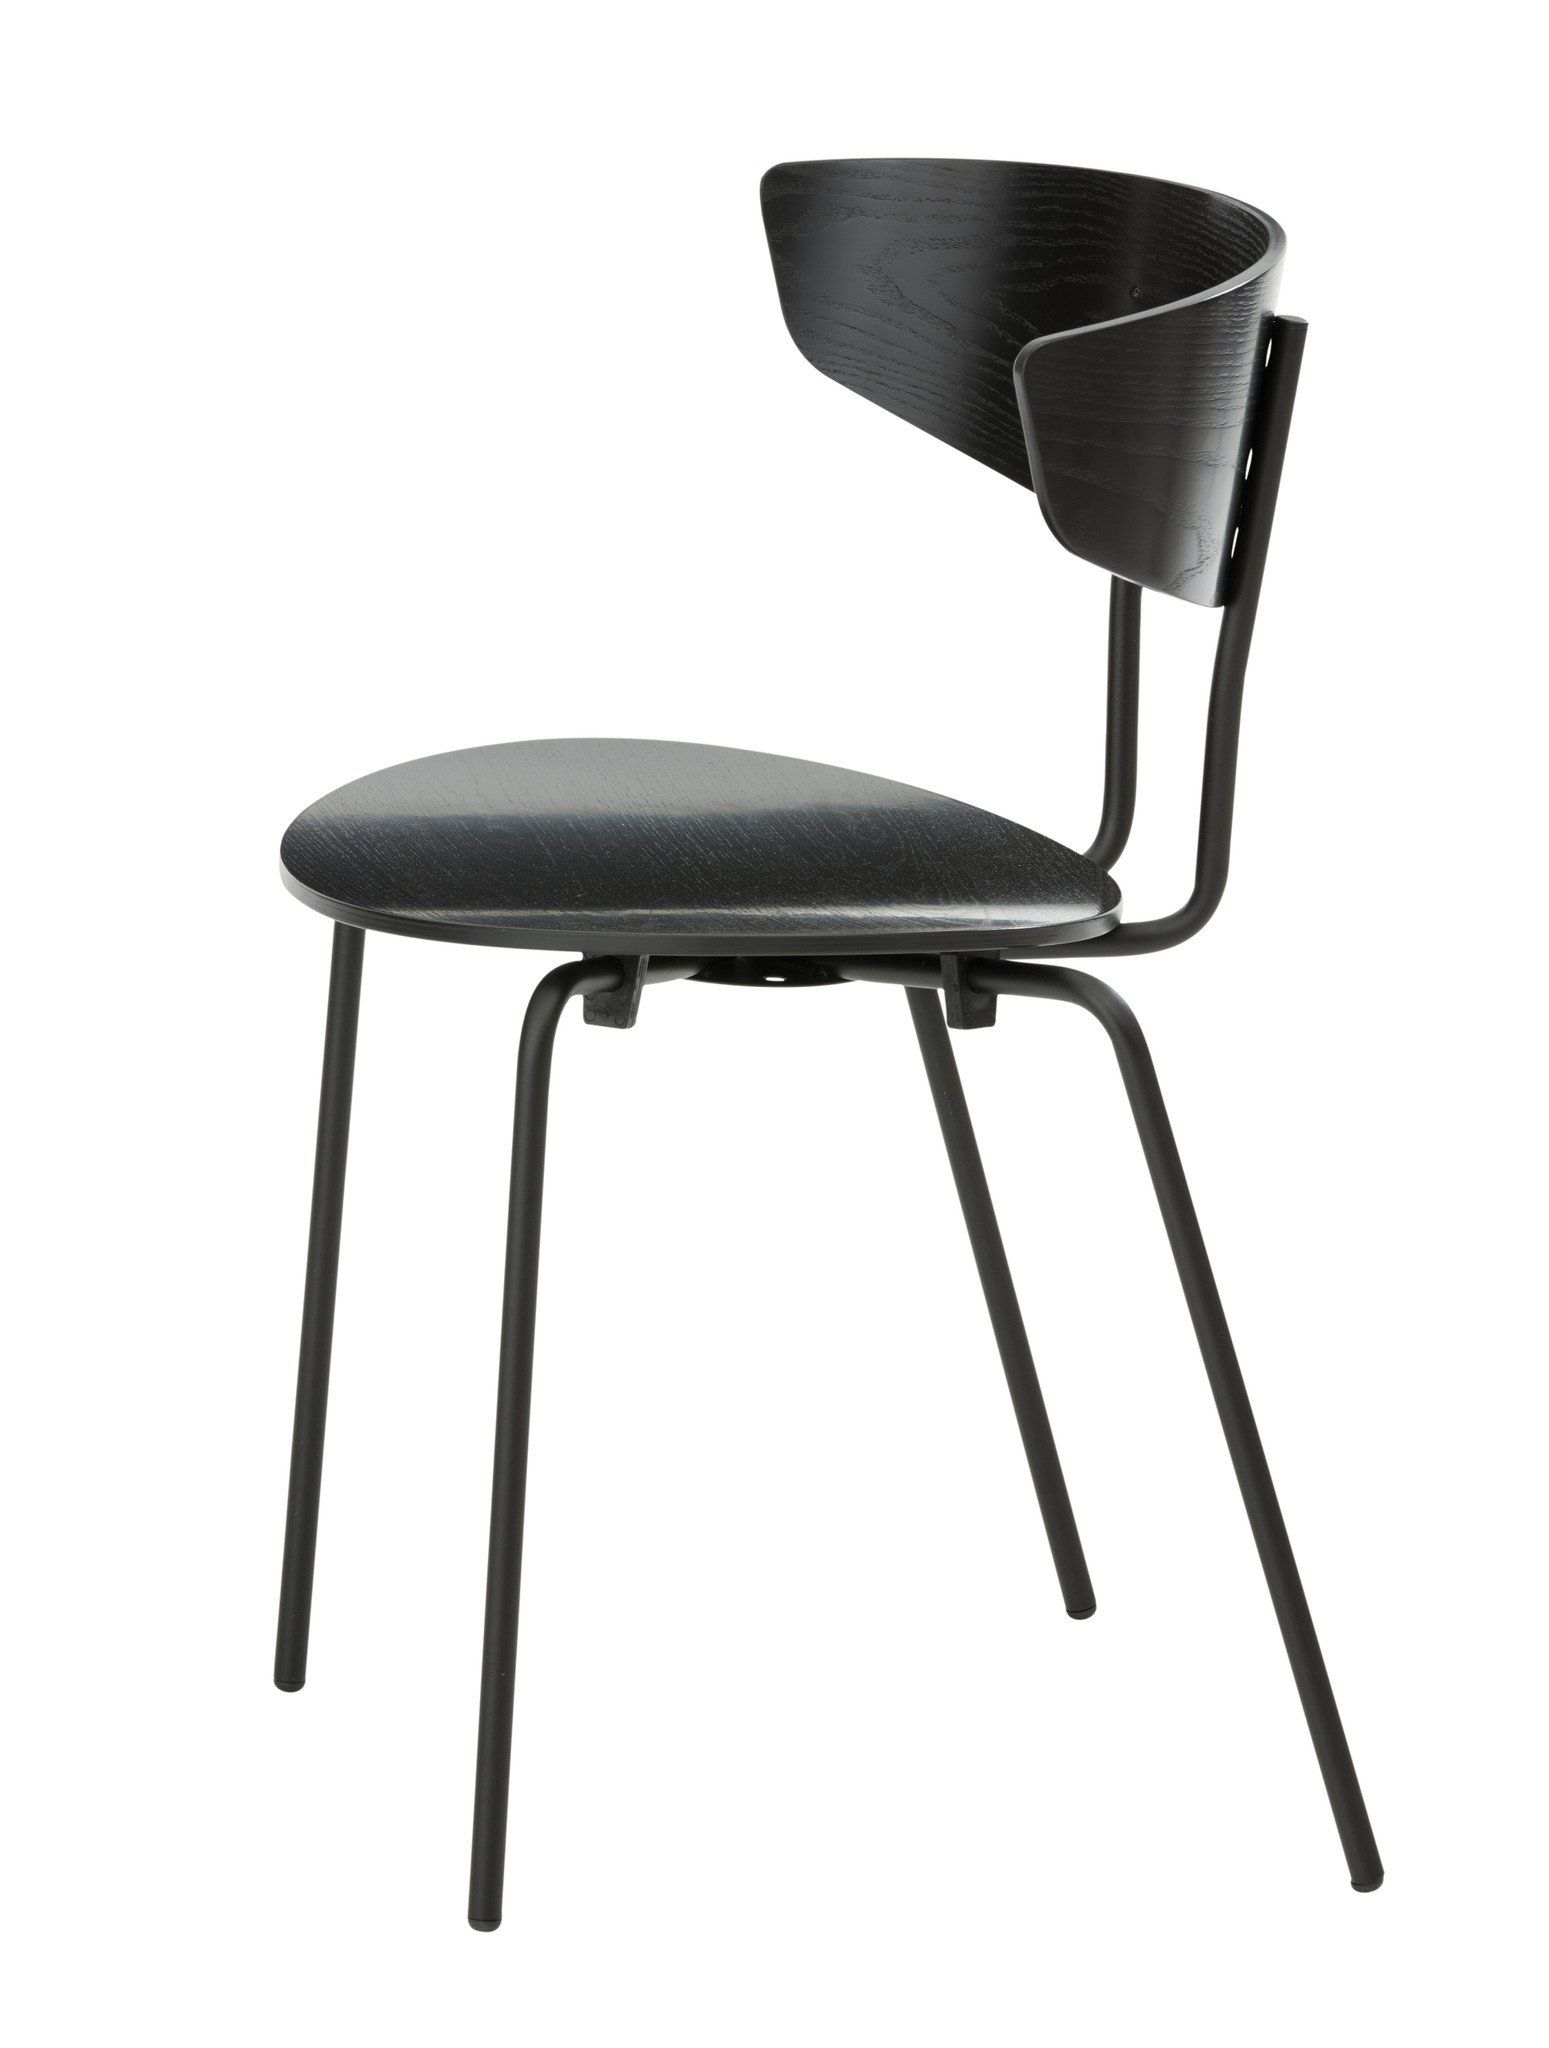 Herman Chair In Black Chair Wayfair Living Room Chairs Danish